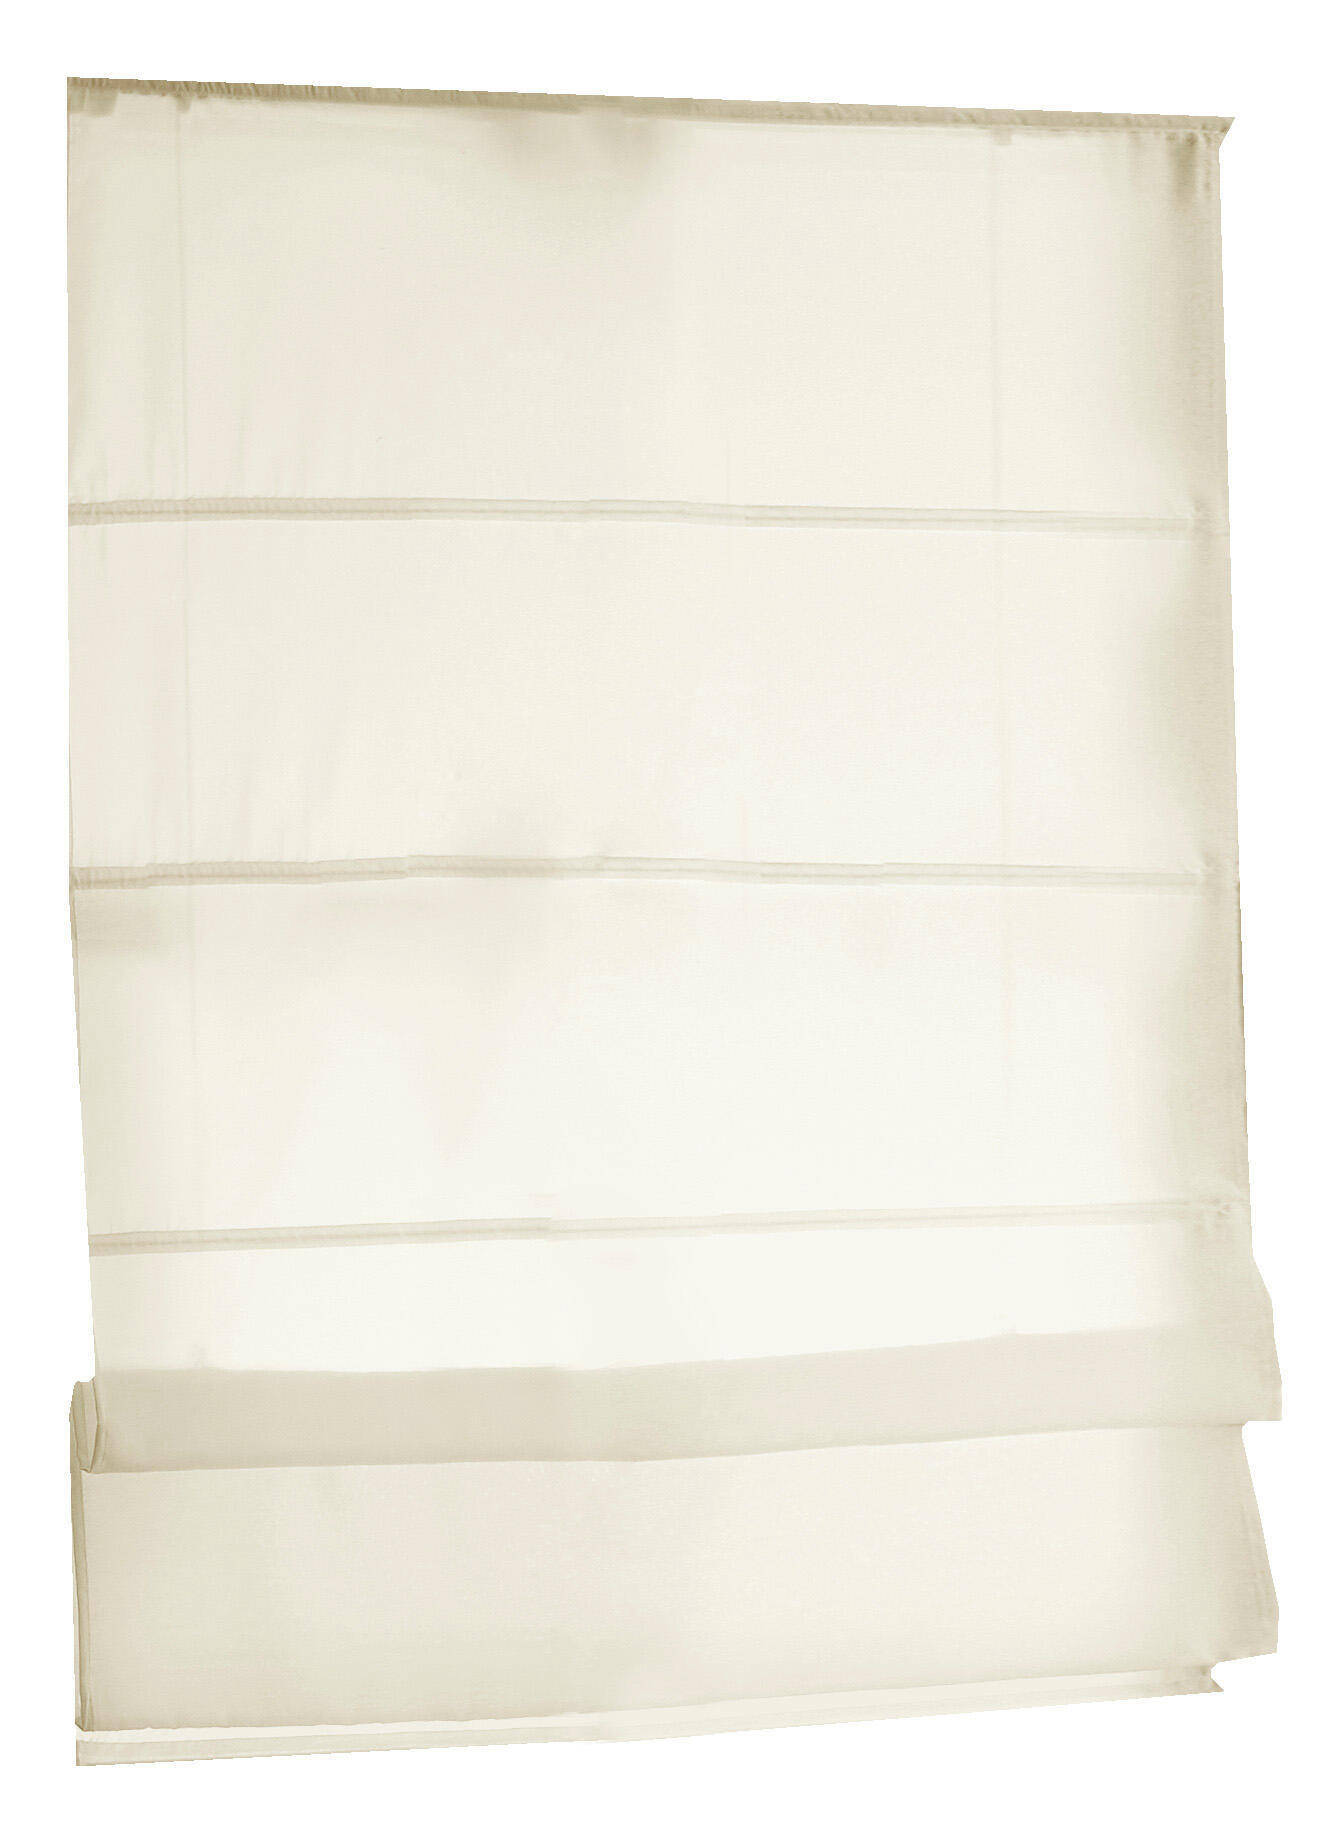 Tenda a pacchetto Maisy bianco 100x150 cm - 1